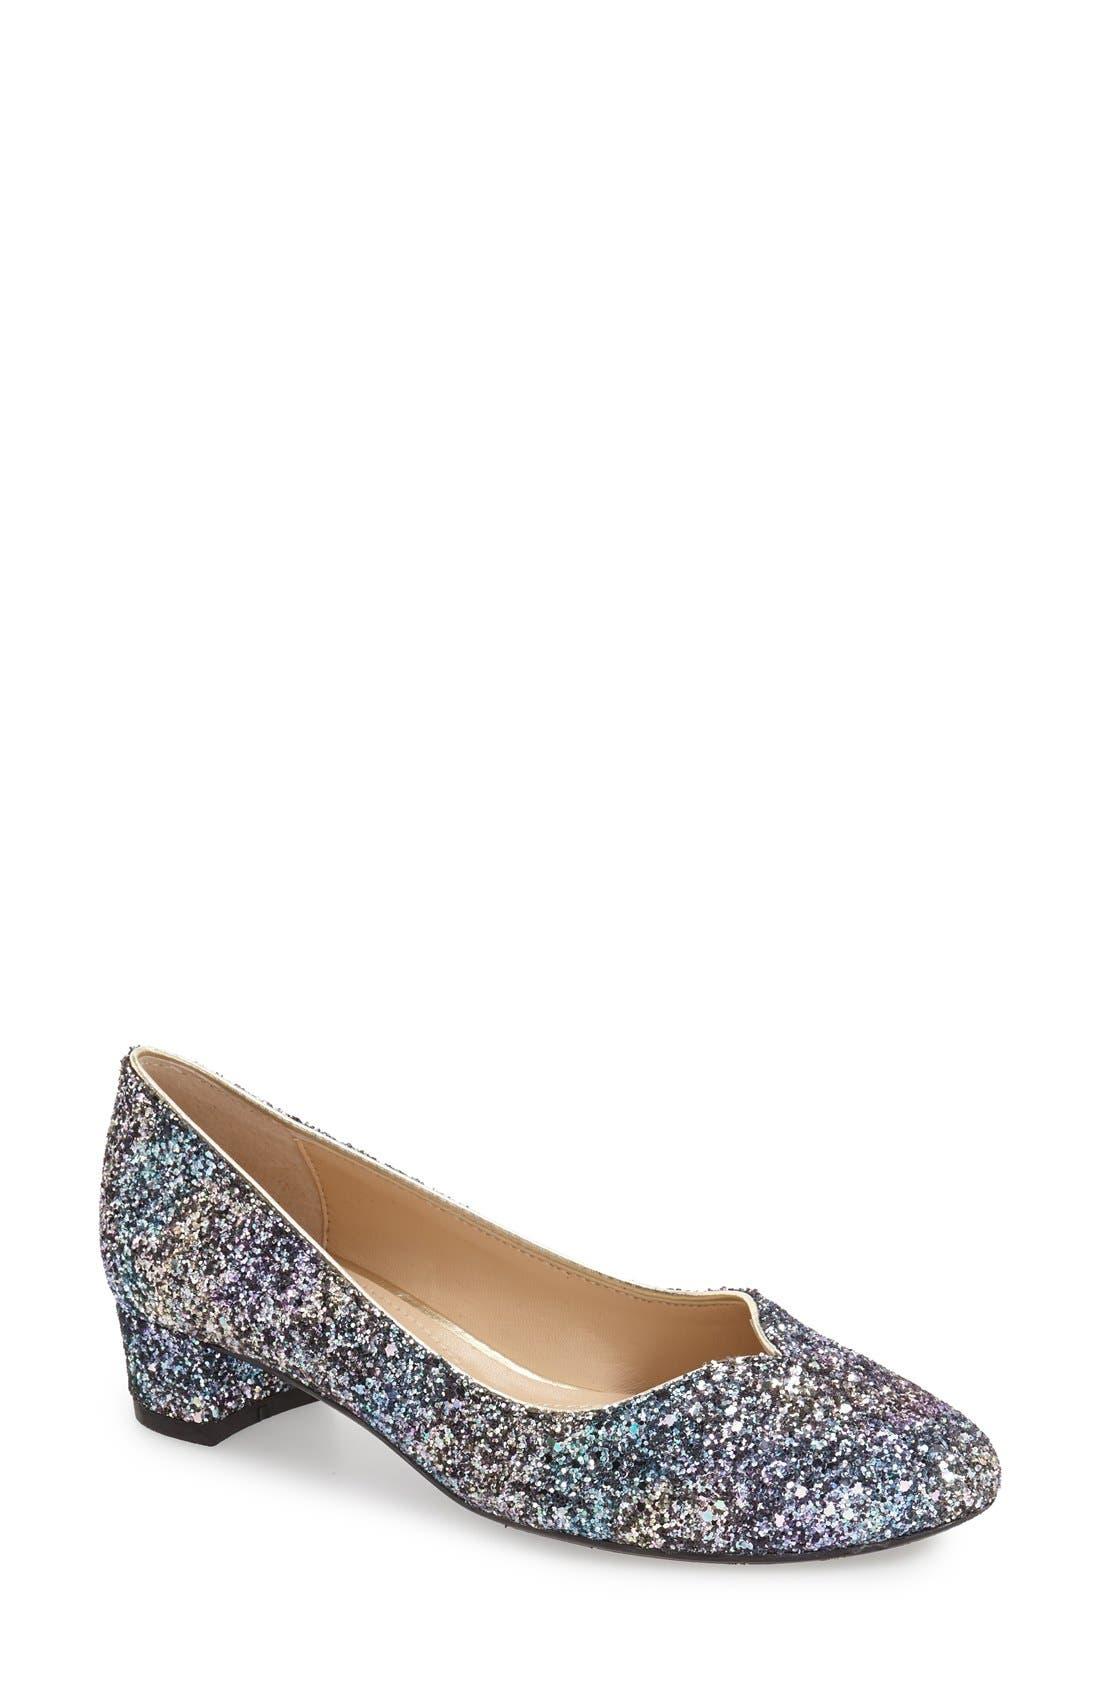 'Bambalina' Block Heel Glitter Pump,                         Main,                         color, Blue/ Gold Glitter Fabric